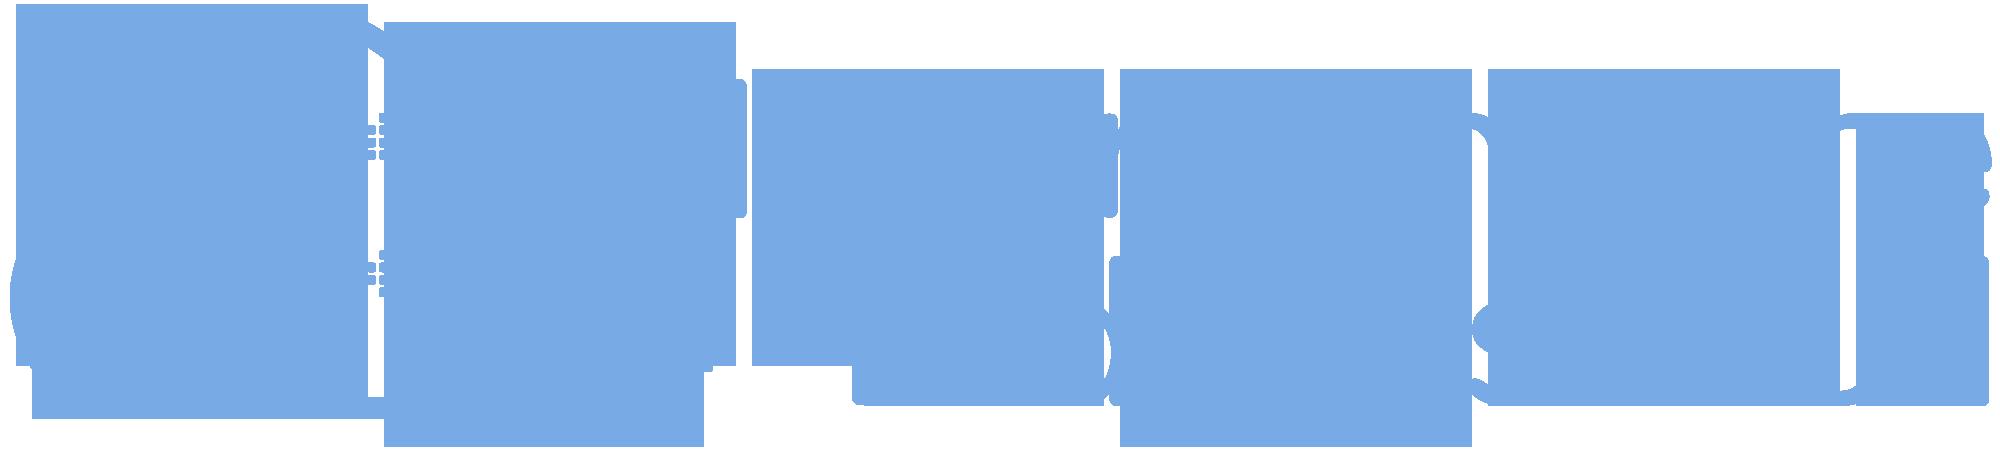 Niedersächsische Bildungscloud